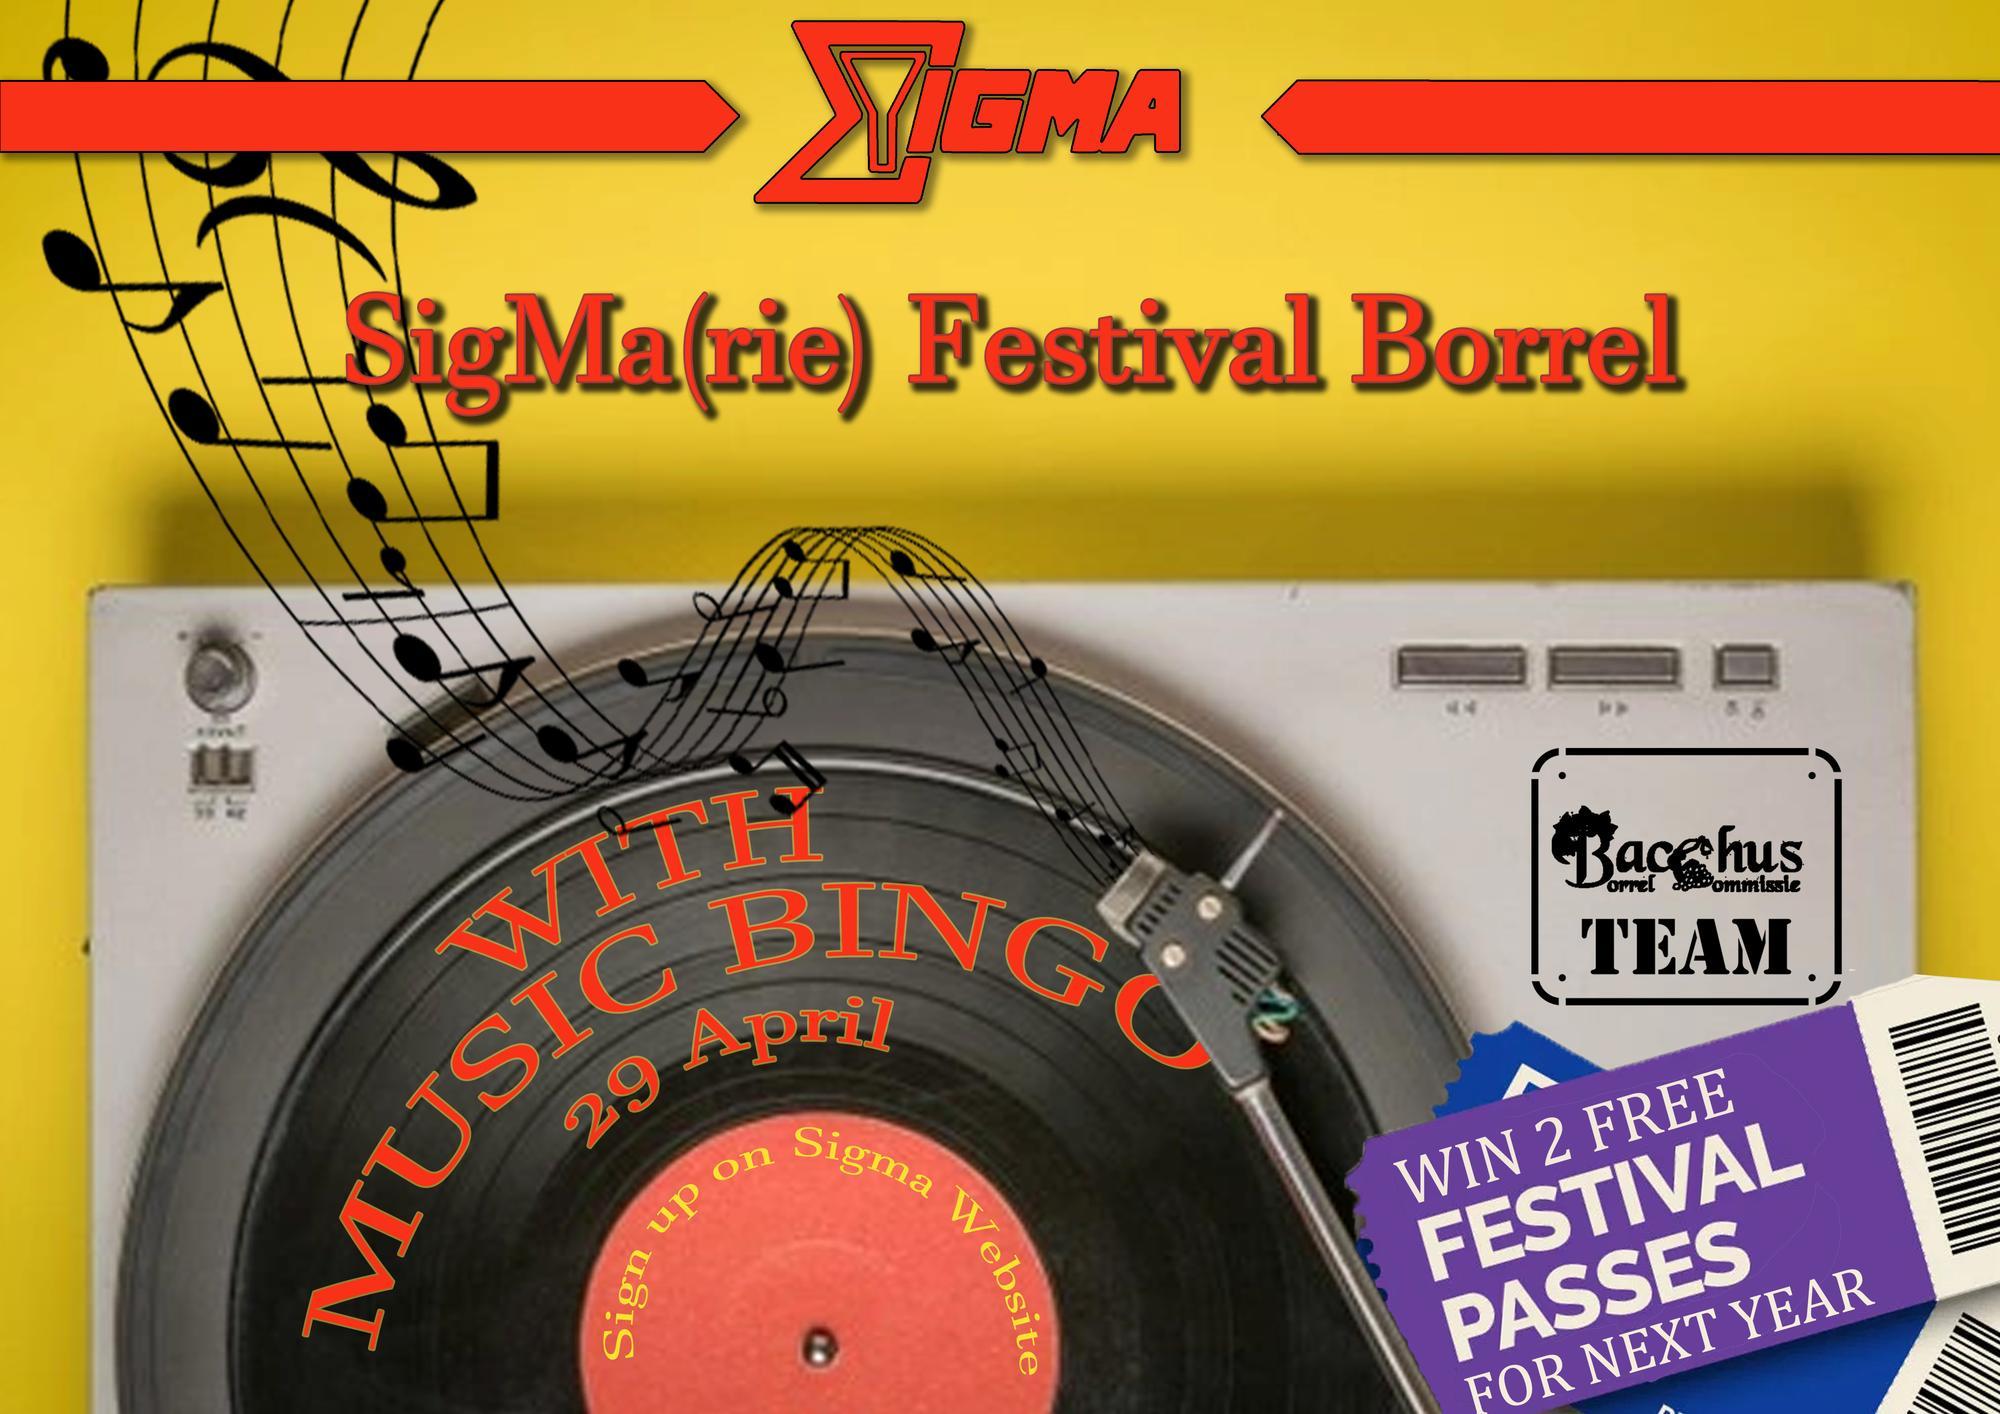 Sigma(rie) Festival Borrel